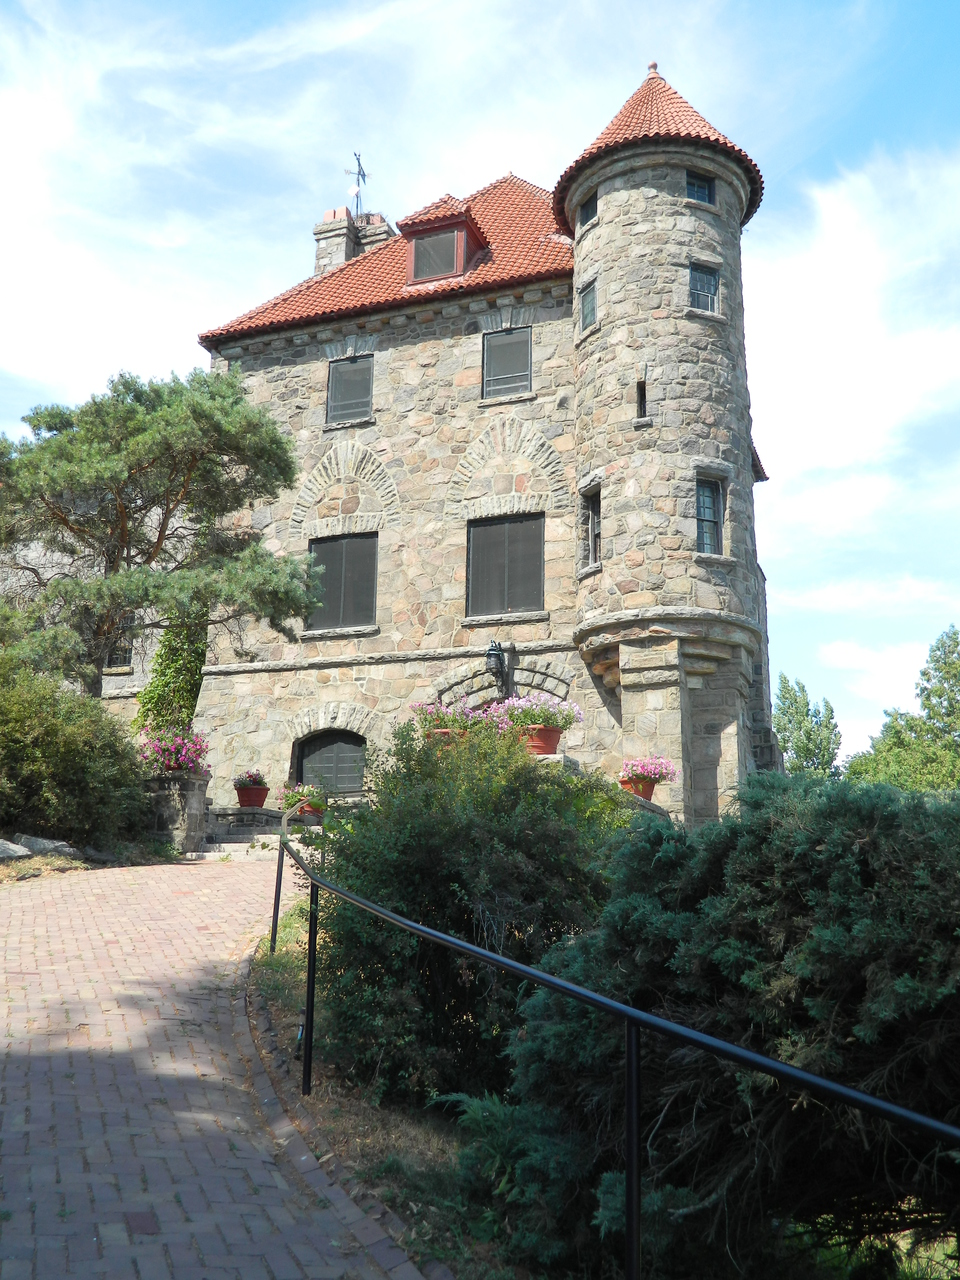 Singer Castle on Dark Island | Hammond, NY 13646 | New York Path ...